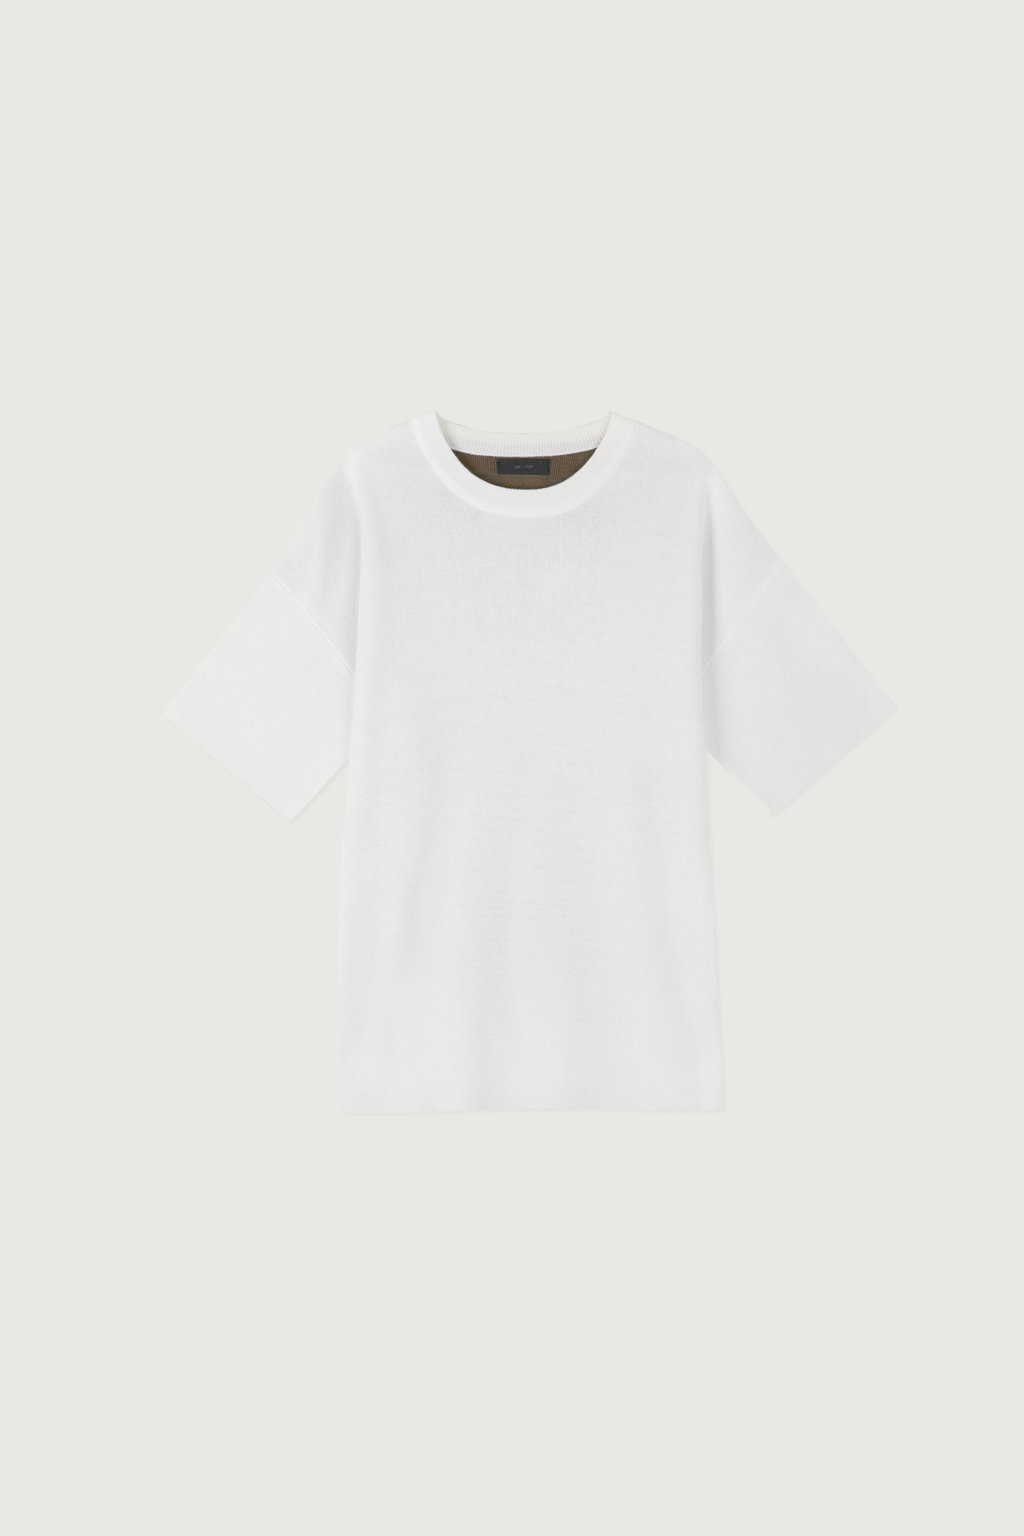 Sweater 3156 Cream 5